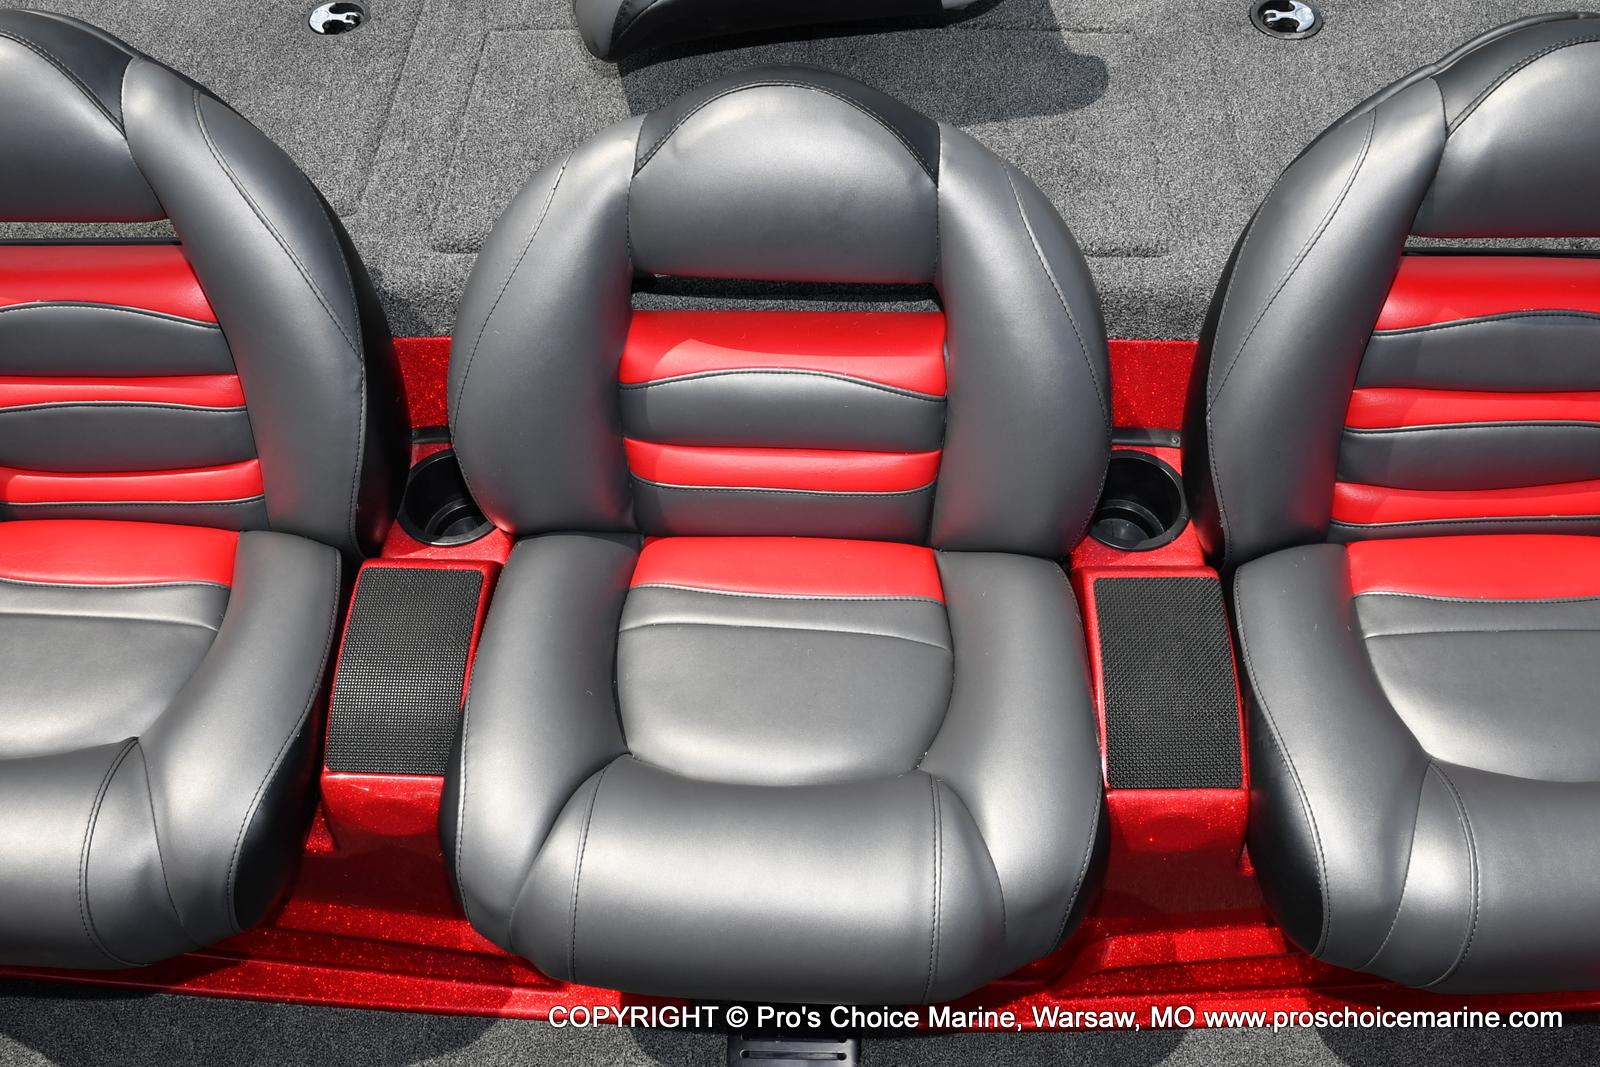 2009 Nitro boat for sale, model of the boat is Z-7 & Image # 14 of 50